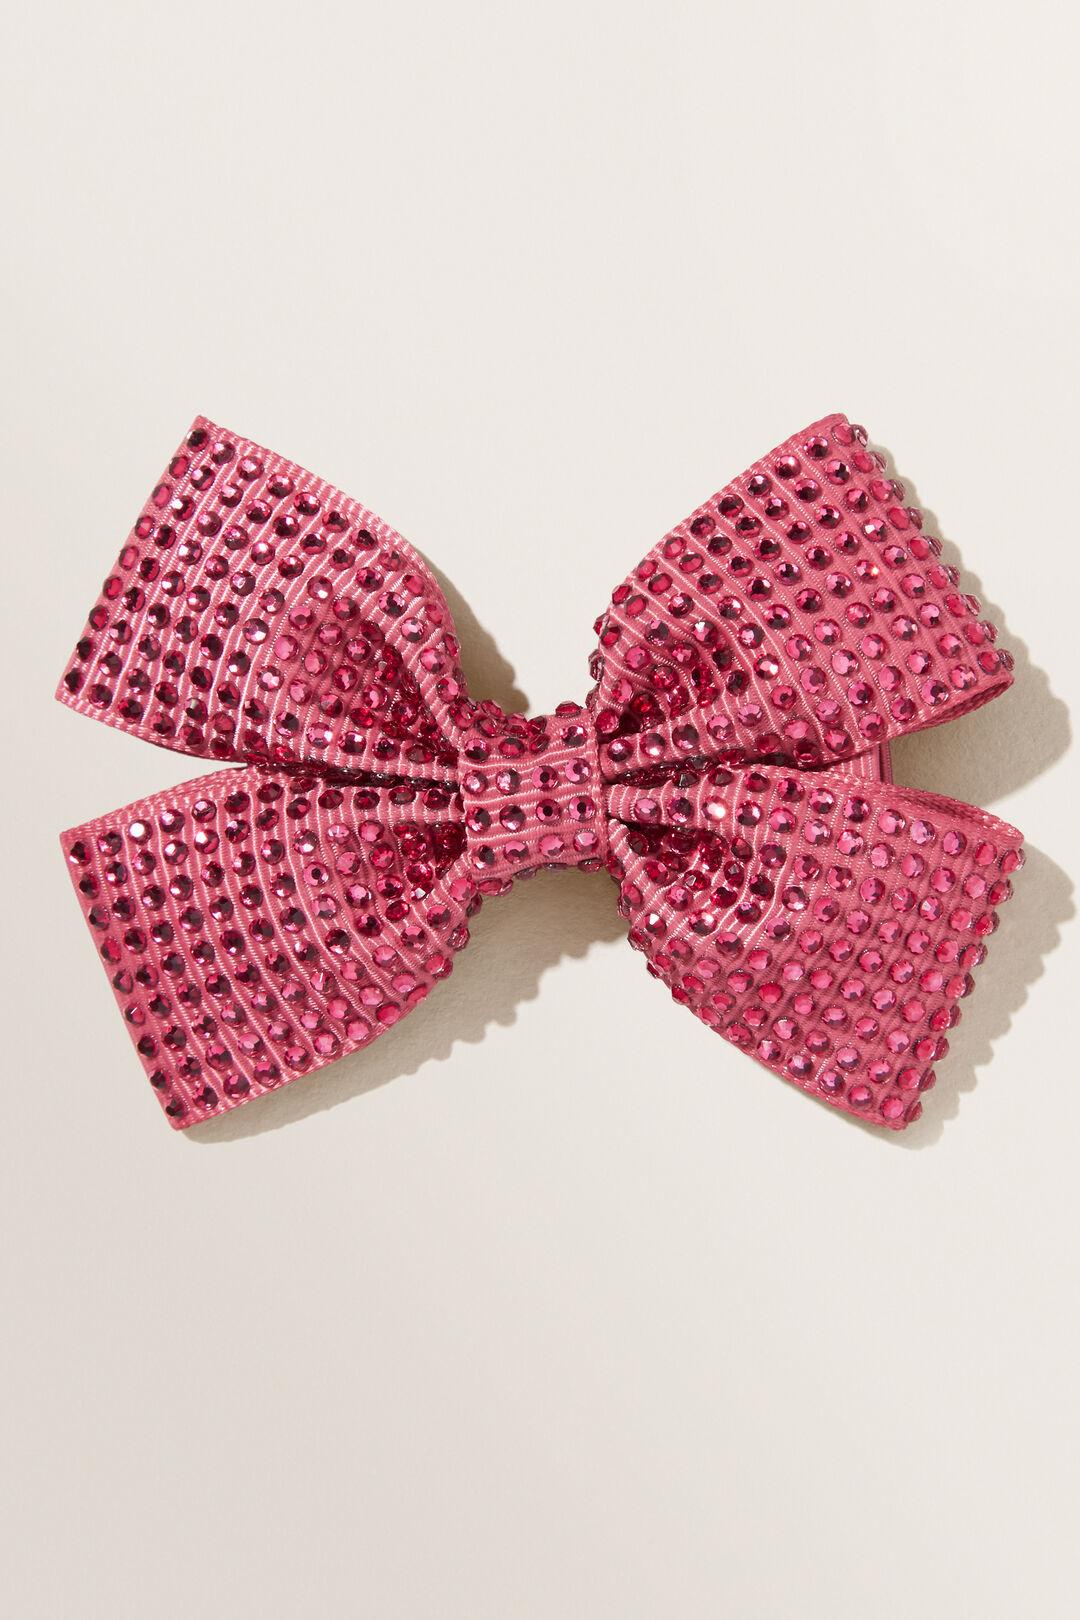 Diamante Bow Clip  BERRY  hi-res